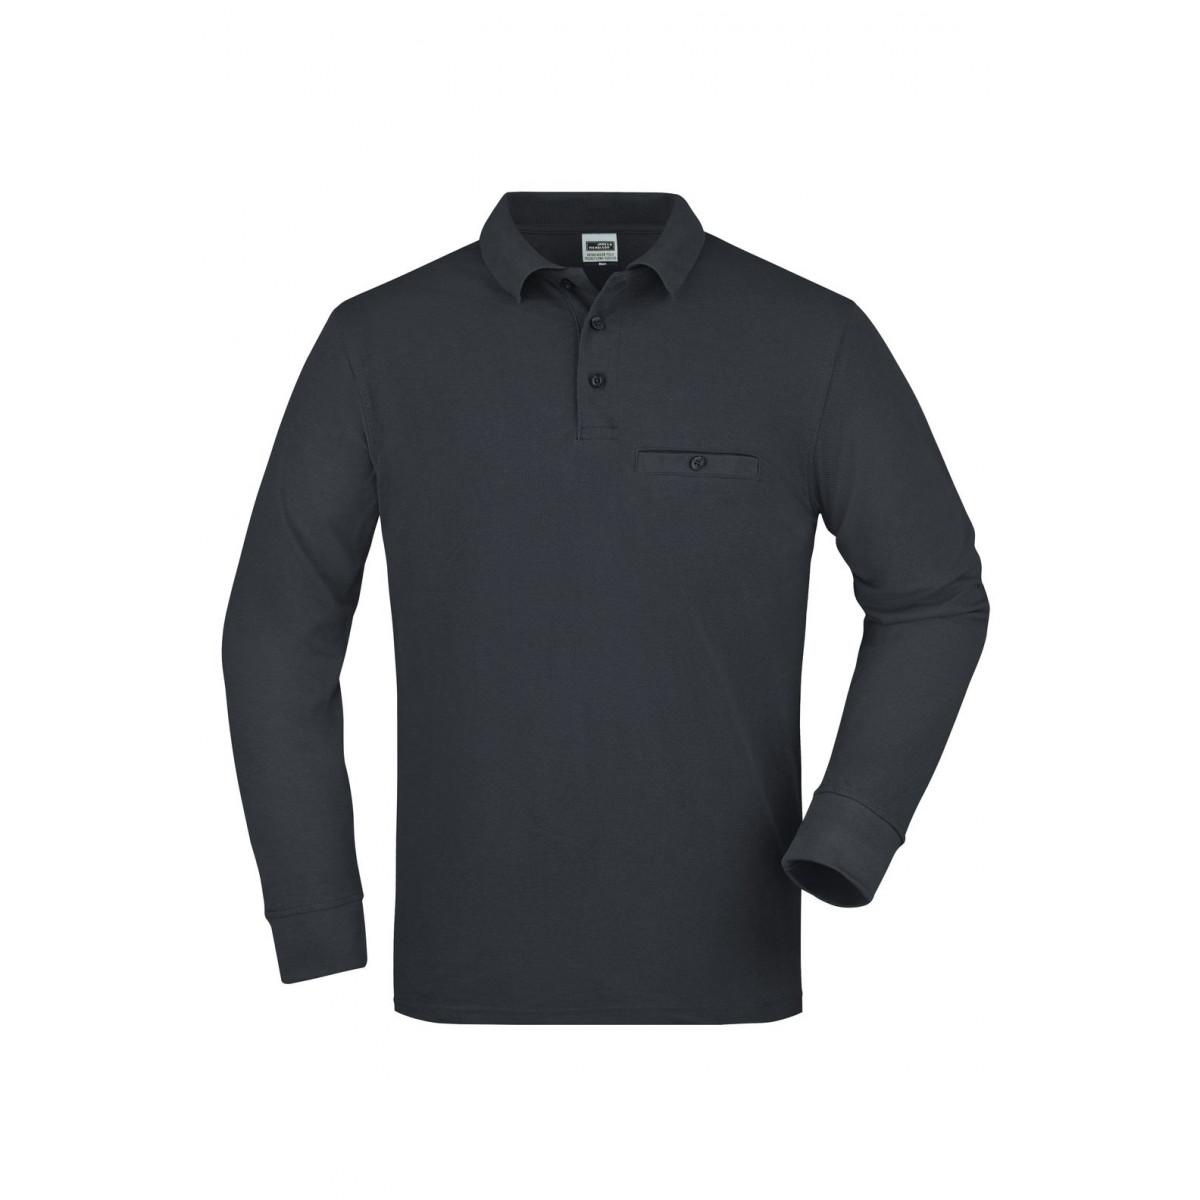 Рубашка поло мужская JN866 Mens Workwear Polo Pocket Longsleeve - Карбон